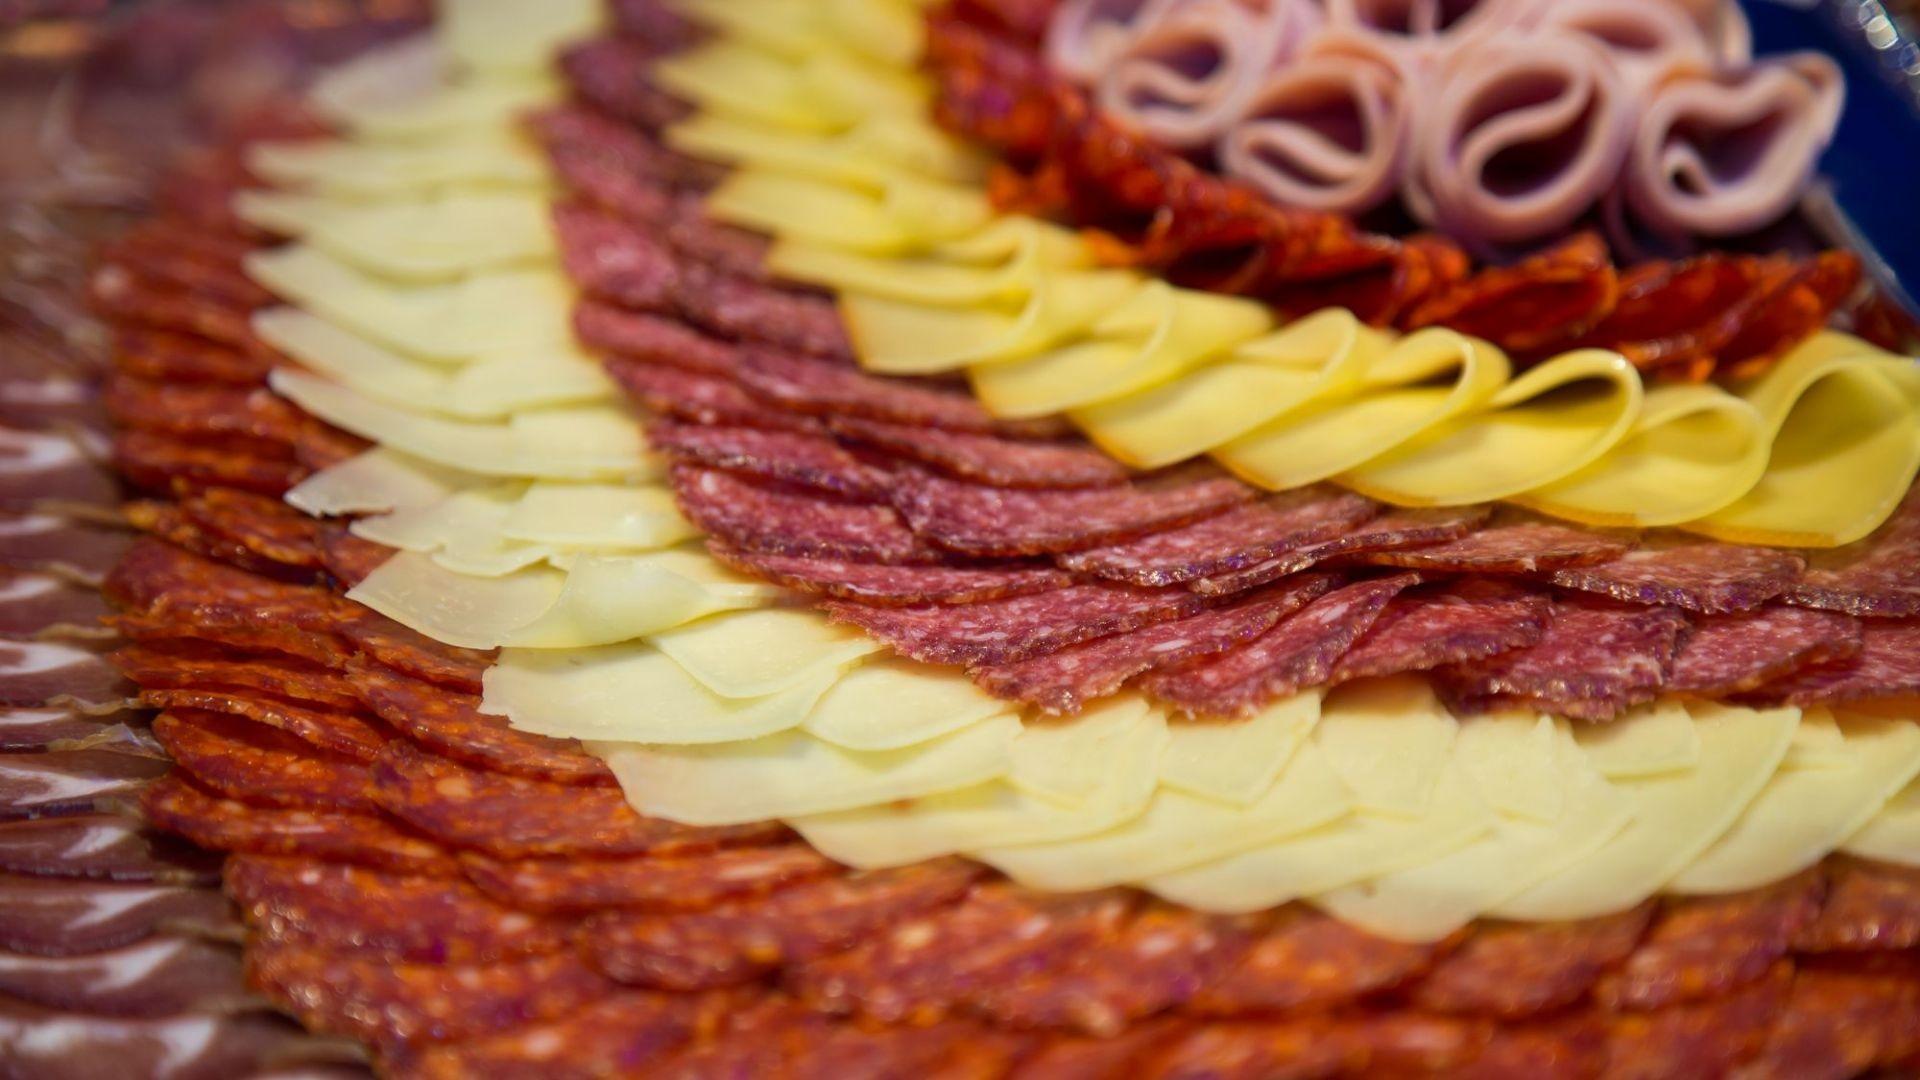 000 embutidos queso chorizo salchichon lomo jamón